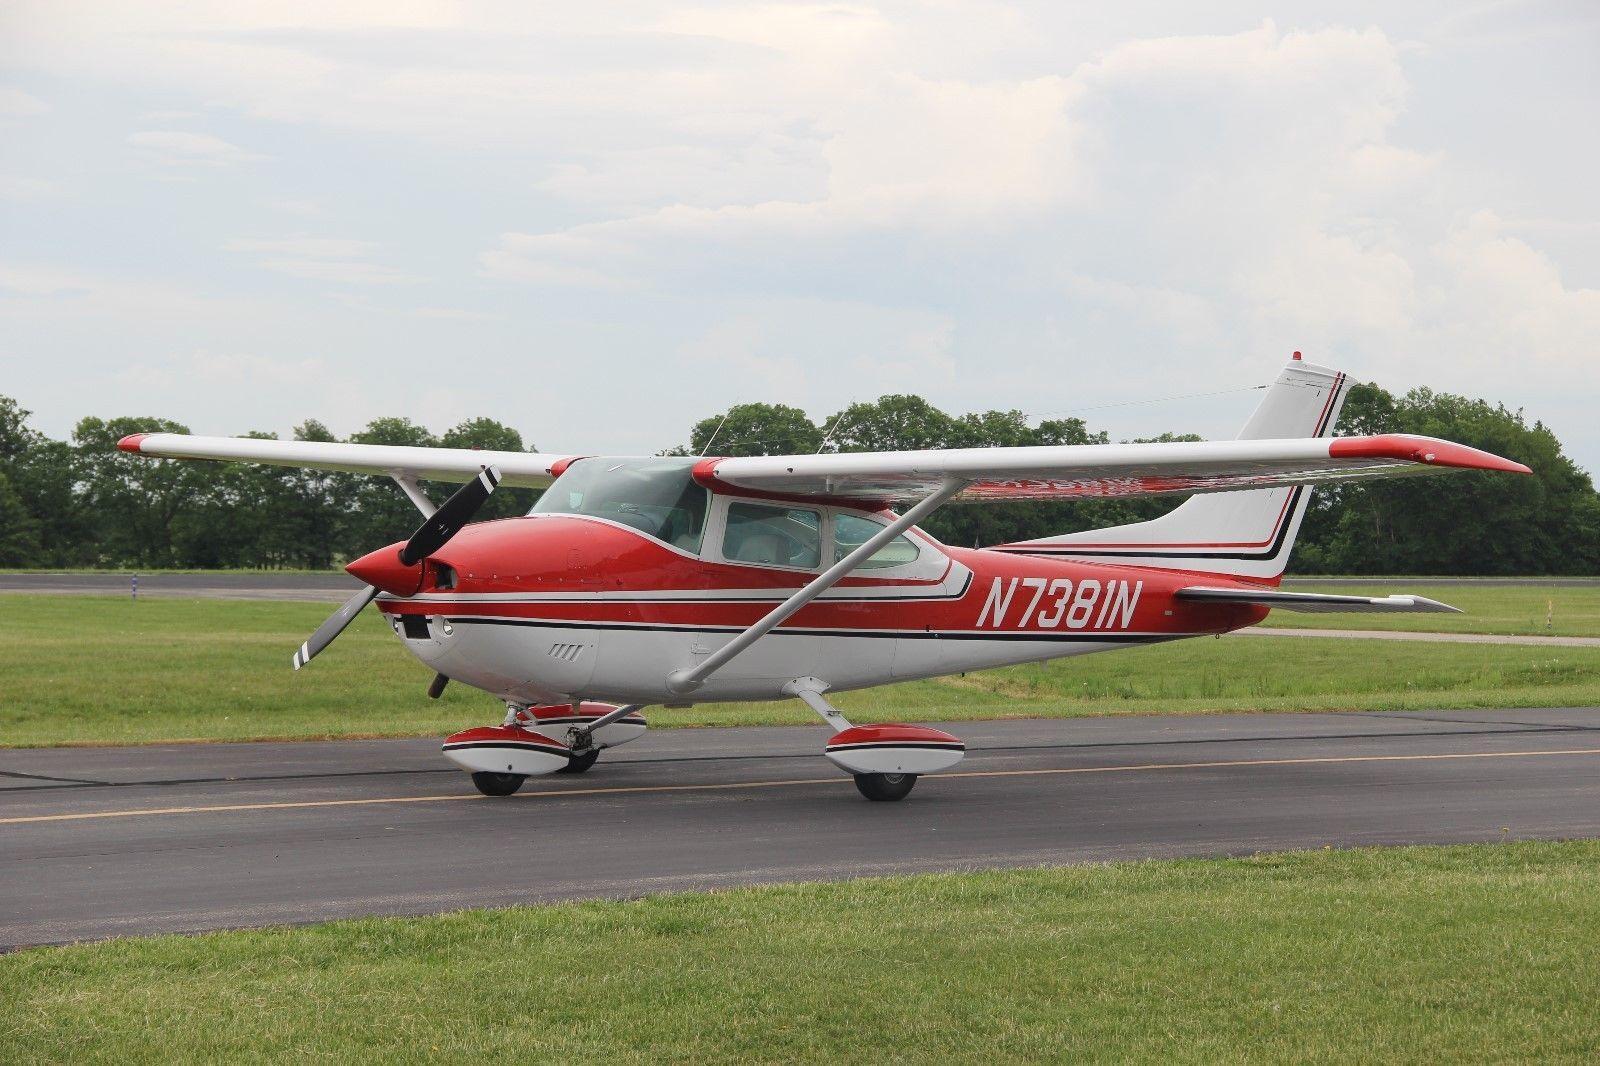 hangared 1974 Cessna 182P SKYLANE aircraft for sale